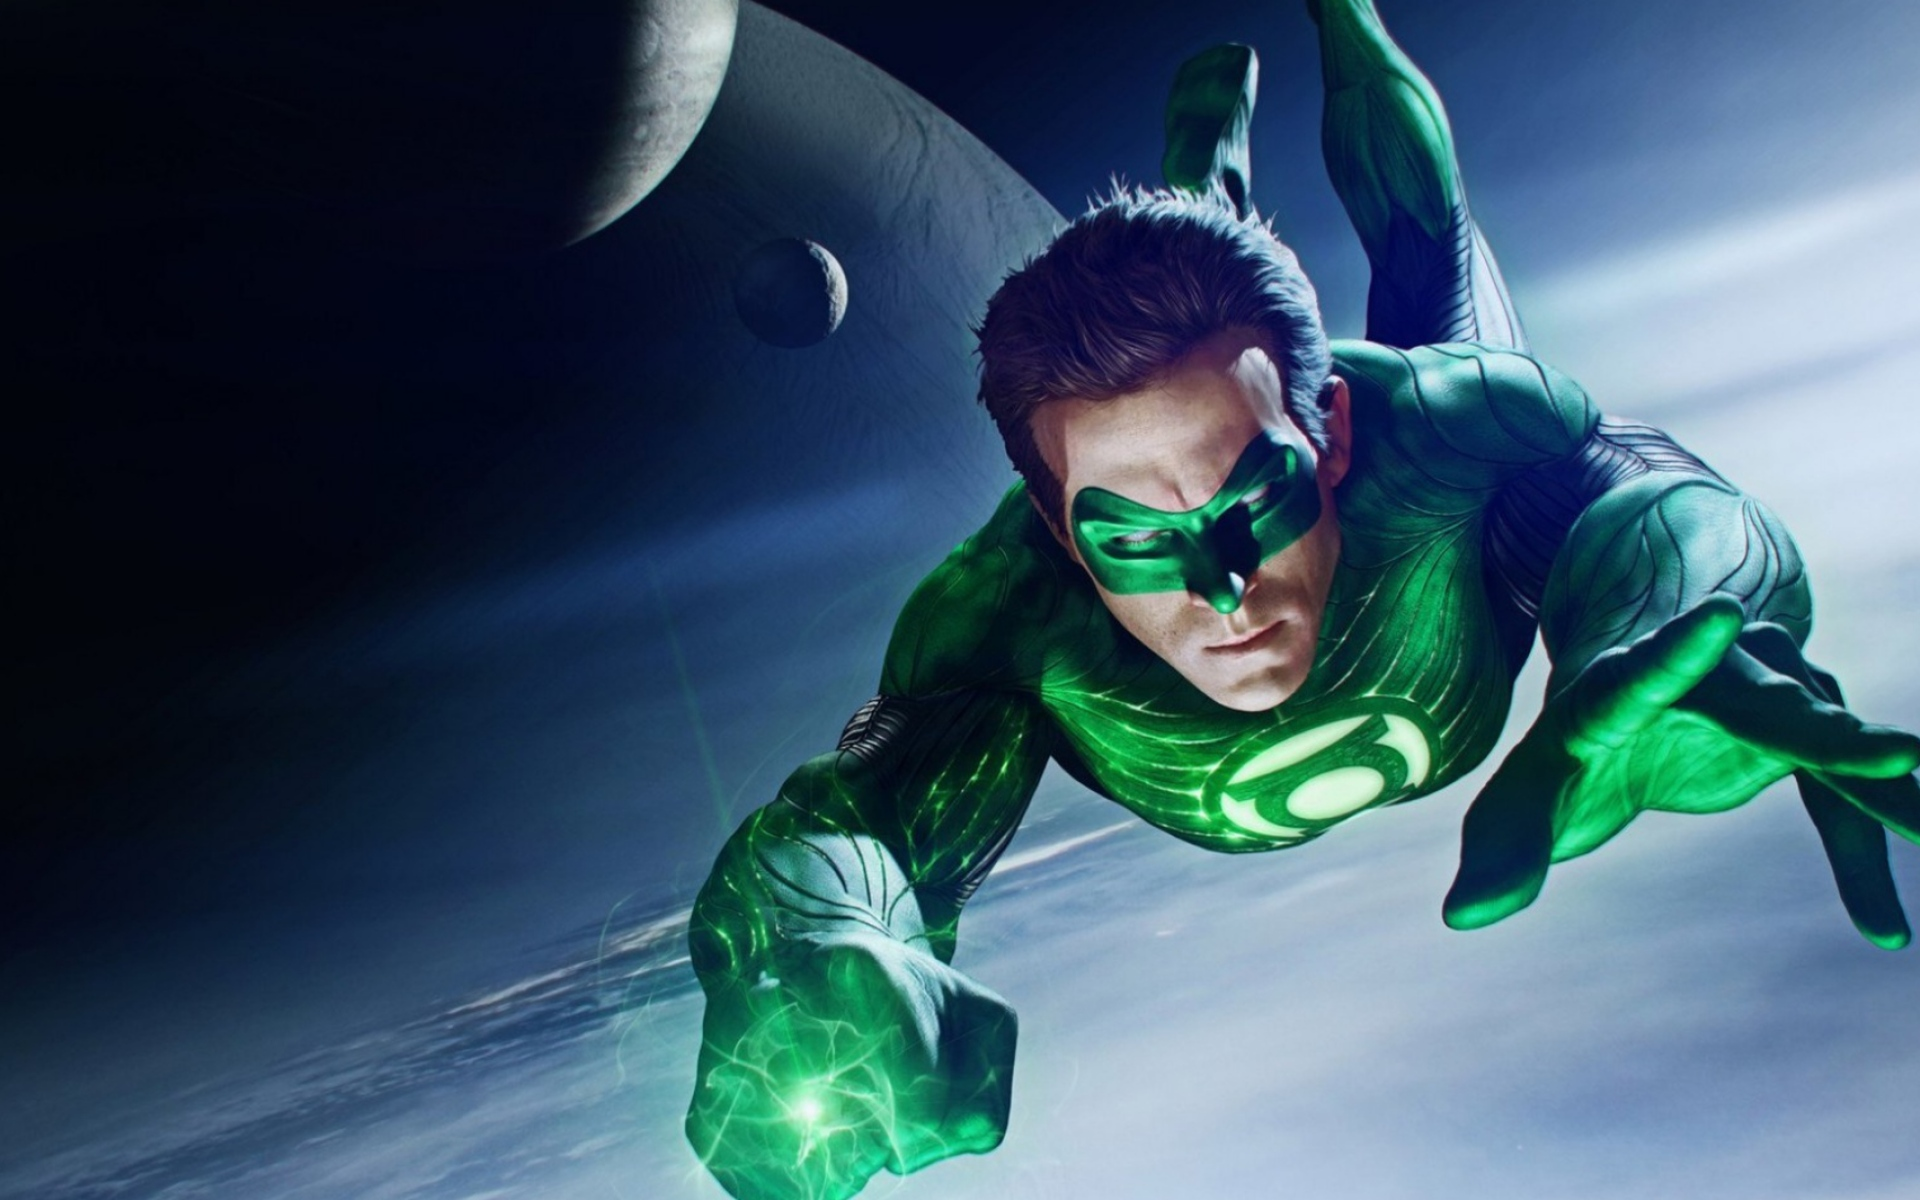 1920x1200 Green Lantern 1080P Resolution HD 4k Wallpapers ...